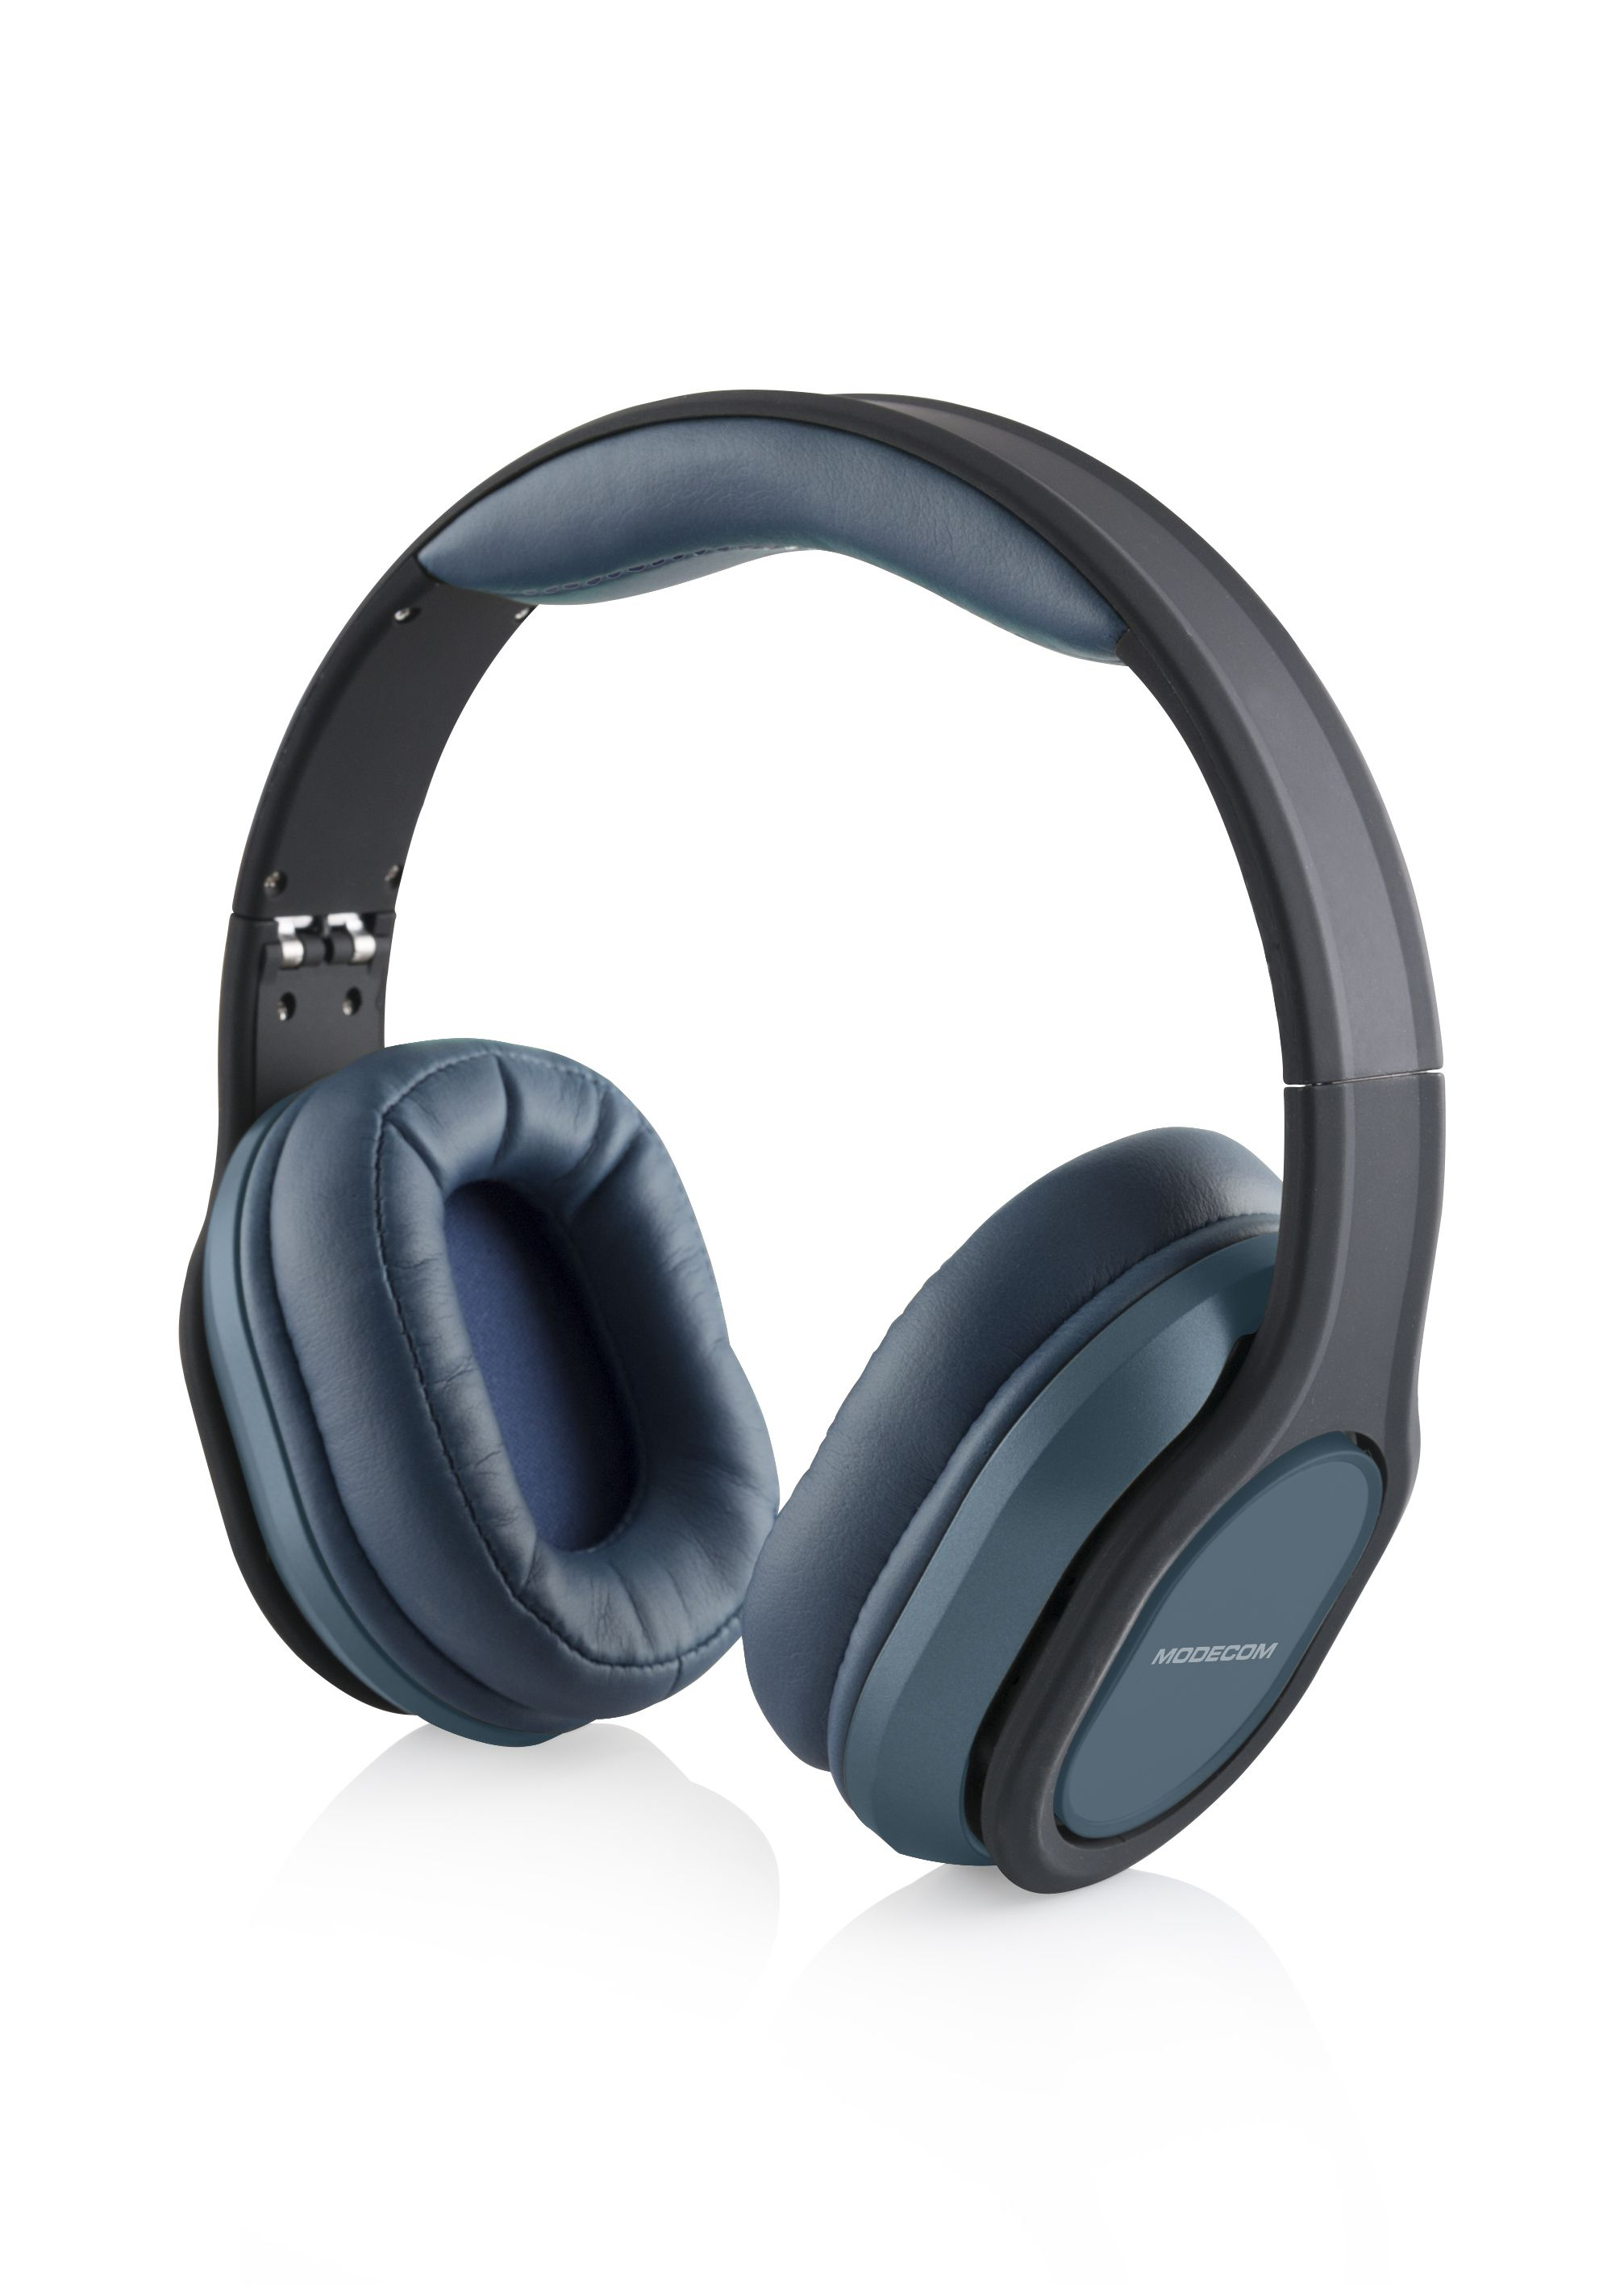 Modecom MC-851 COMFORT Headset Hoofdband 3,5mm-connector Blauw